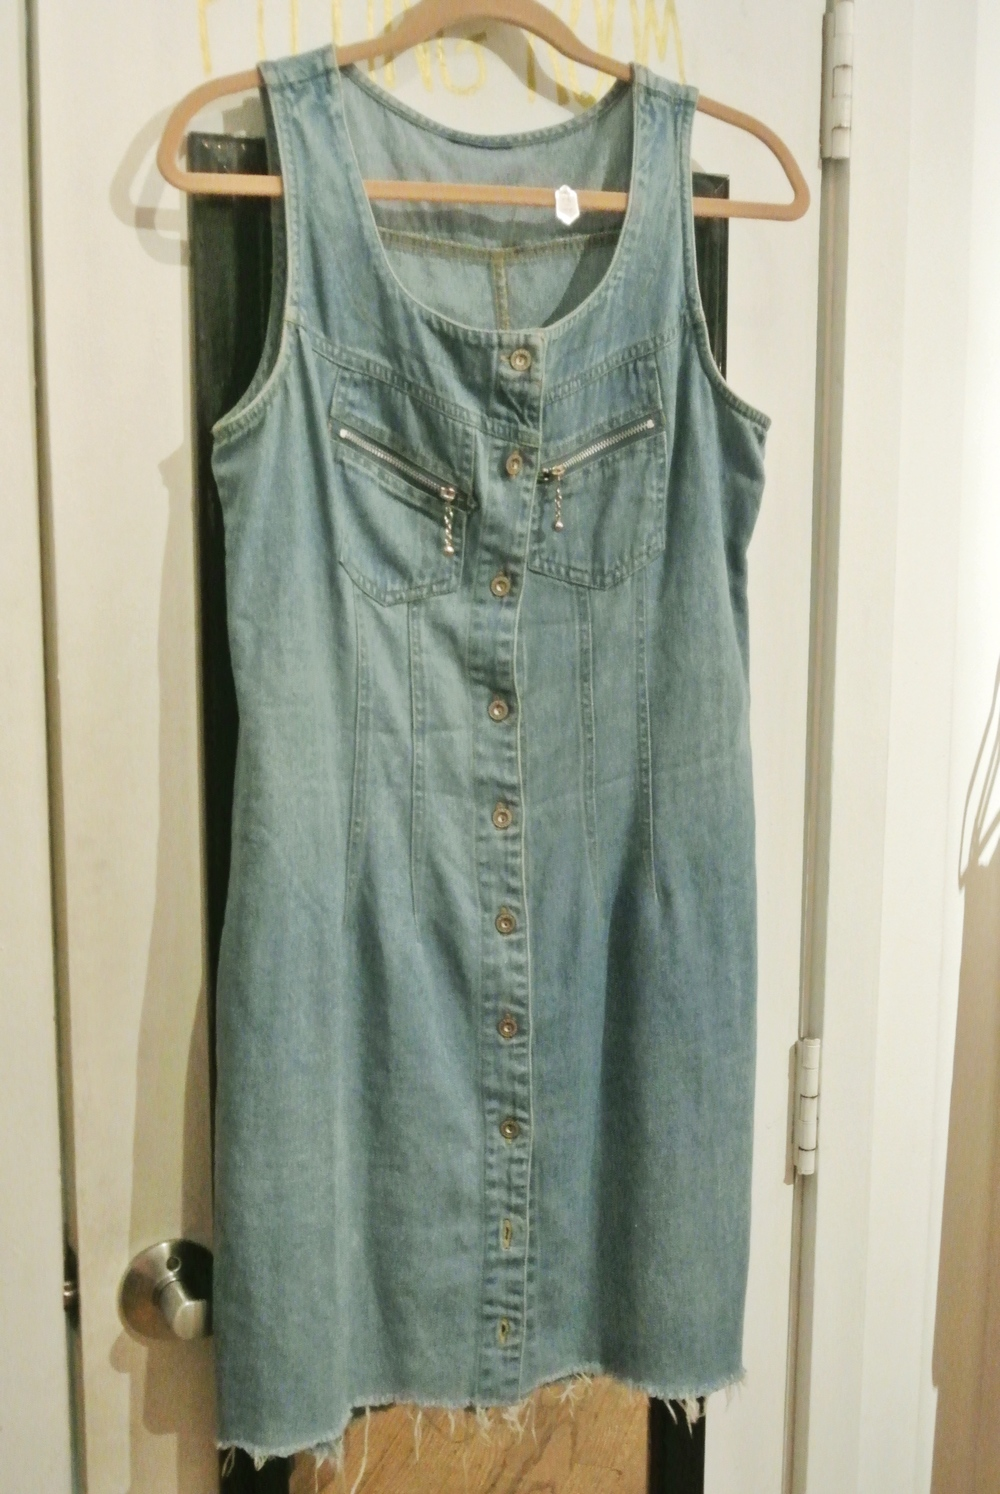 90s-style denim jumper, $12